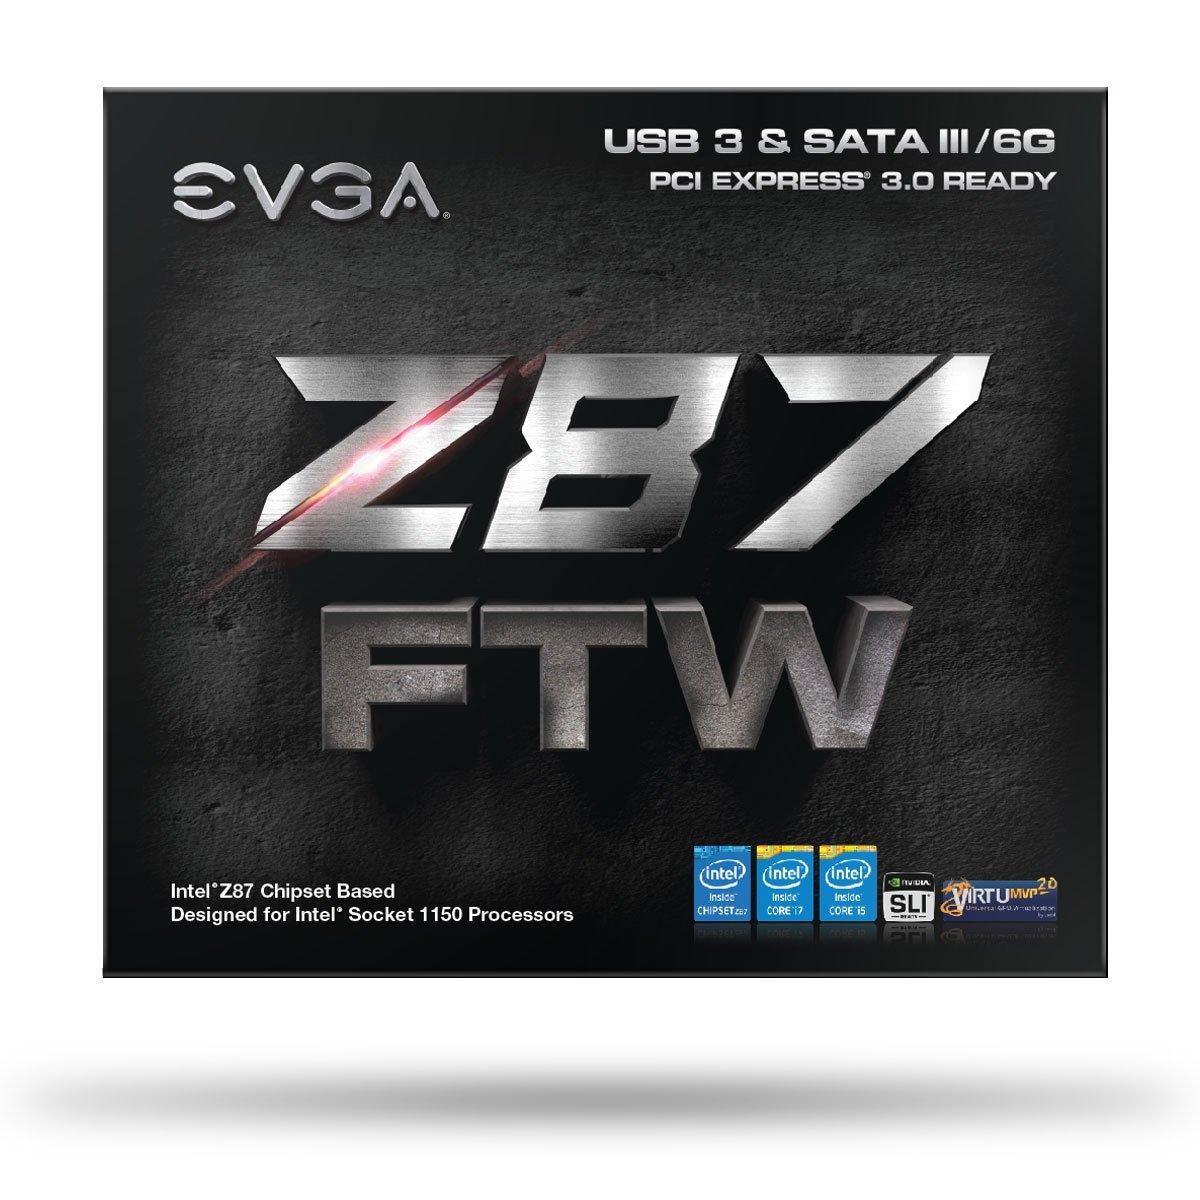 EVGA Z87 CLASSIFIED ASMEDIA ESATA DRIVERS DOWNLOAD